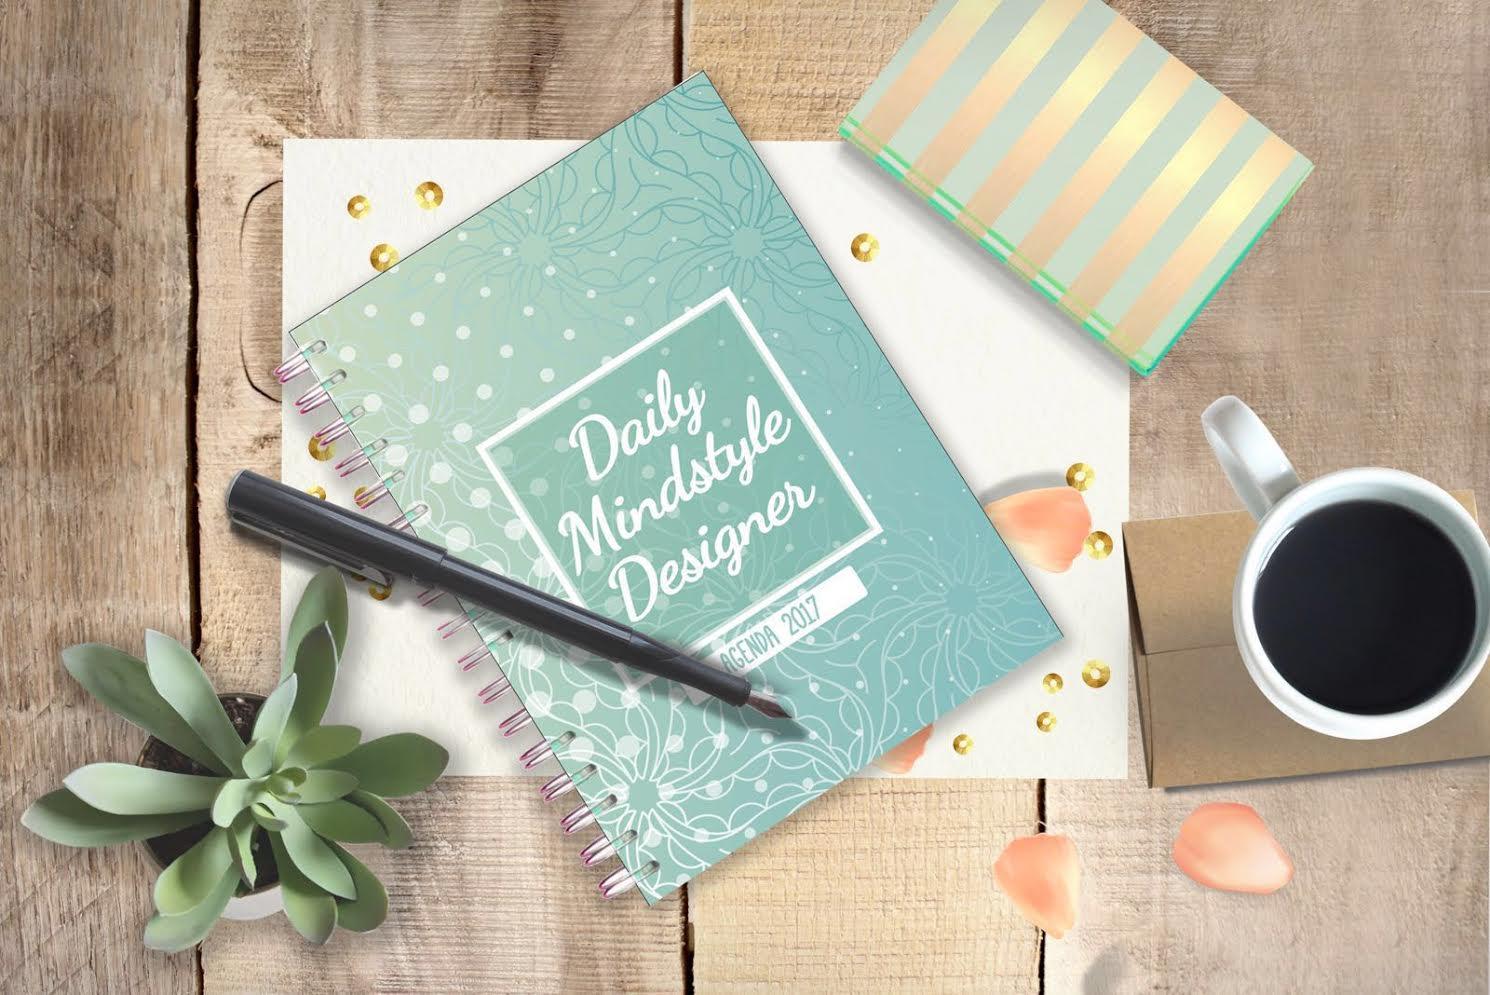 agenda-daily-mindstyle-designer-2017